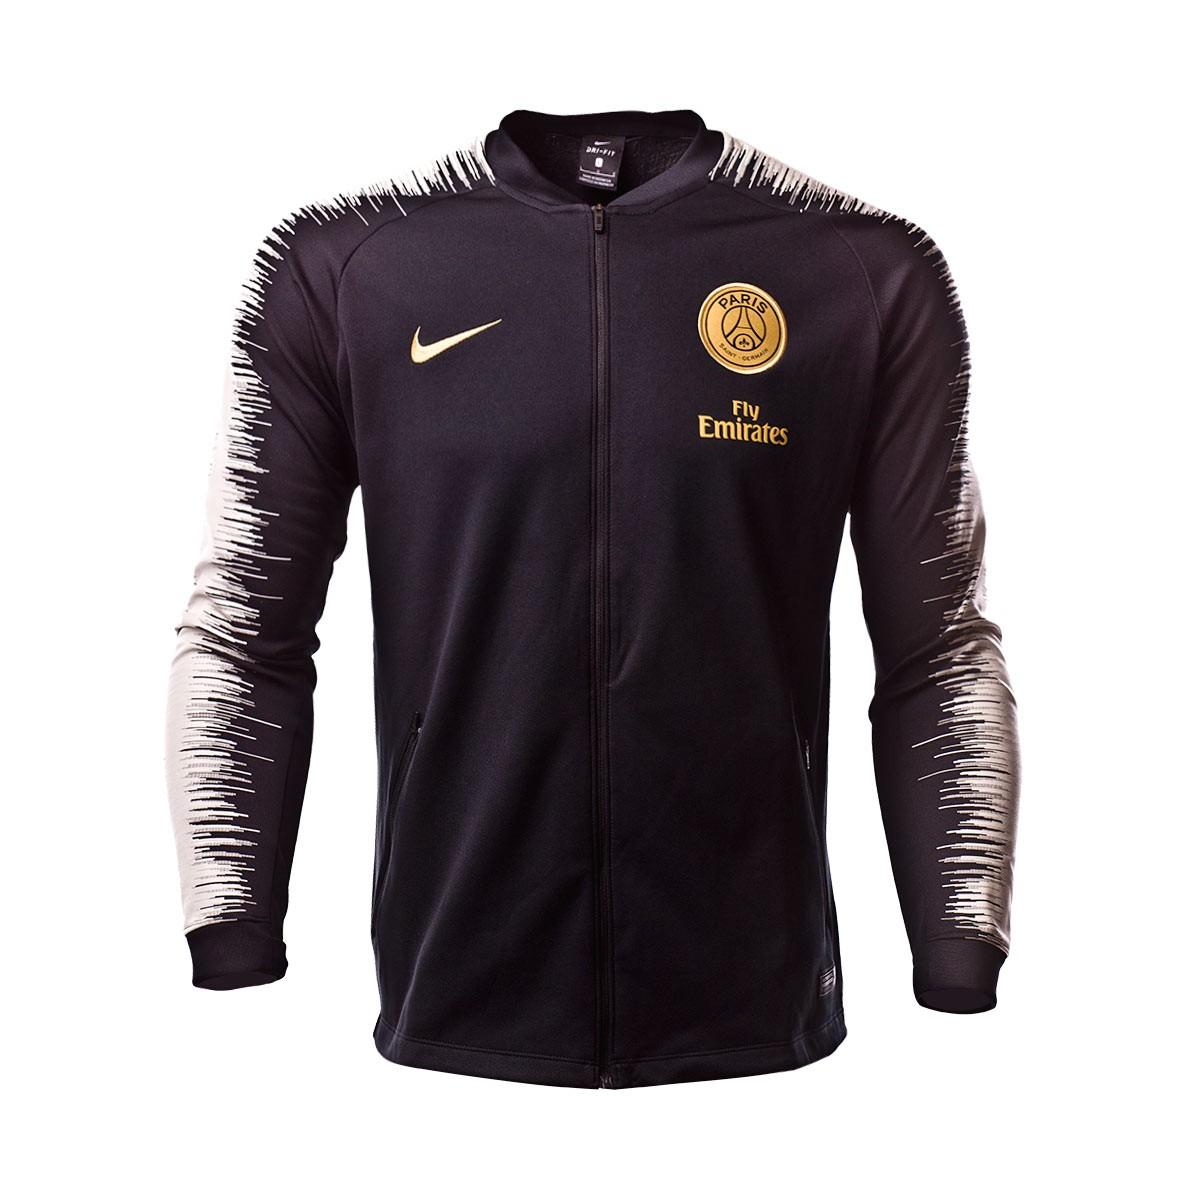 Casaco Nike Paris Saint-Germain 2018-2019 Black-Light bone-Truly gold -  Loja de futebol Fútbol Emotion e62ee1492be2f